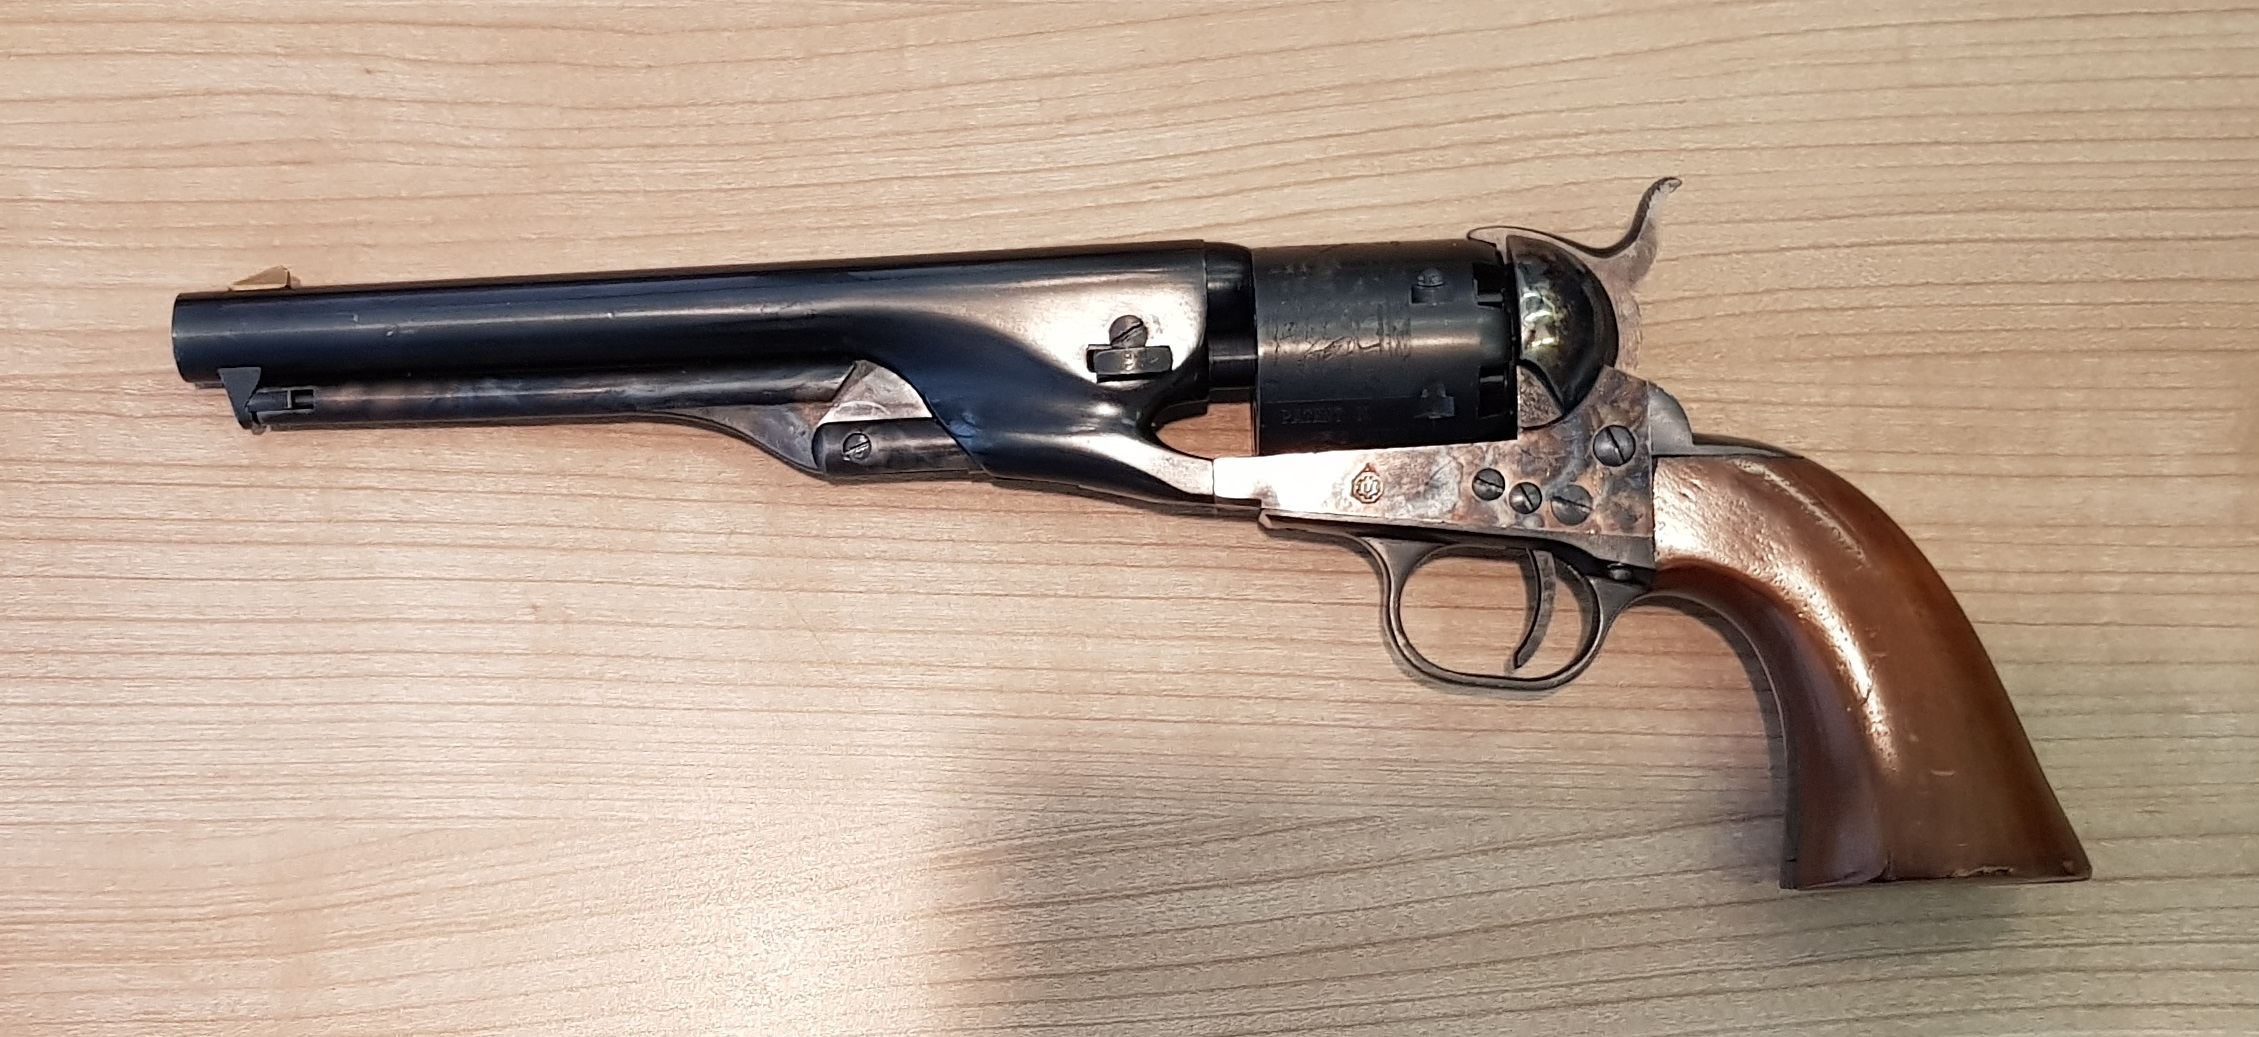 Rewolwer Colt Navy 1861 .36 (Hege Uberti)